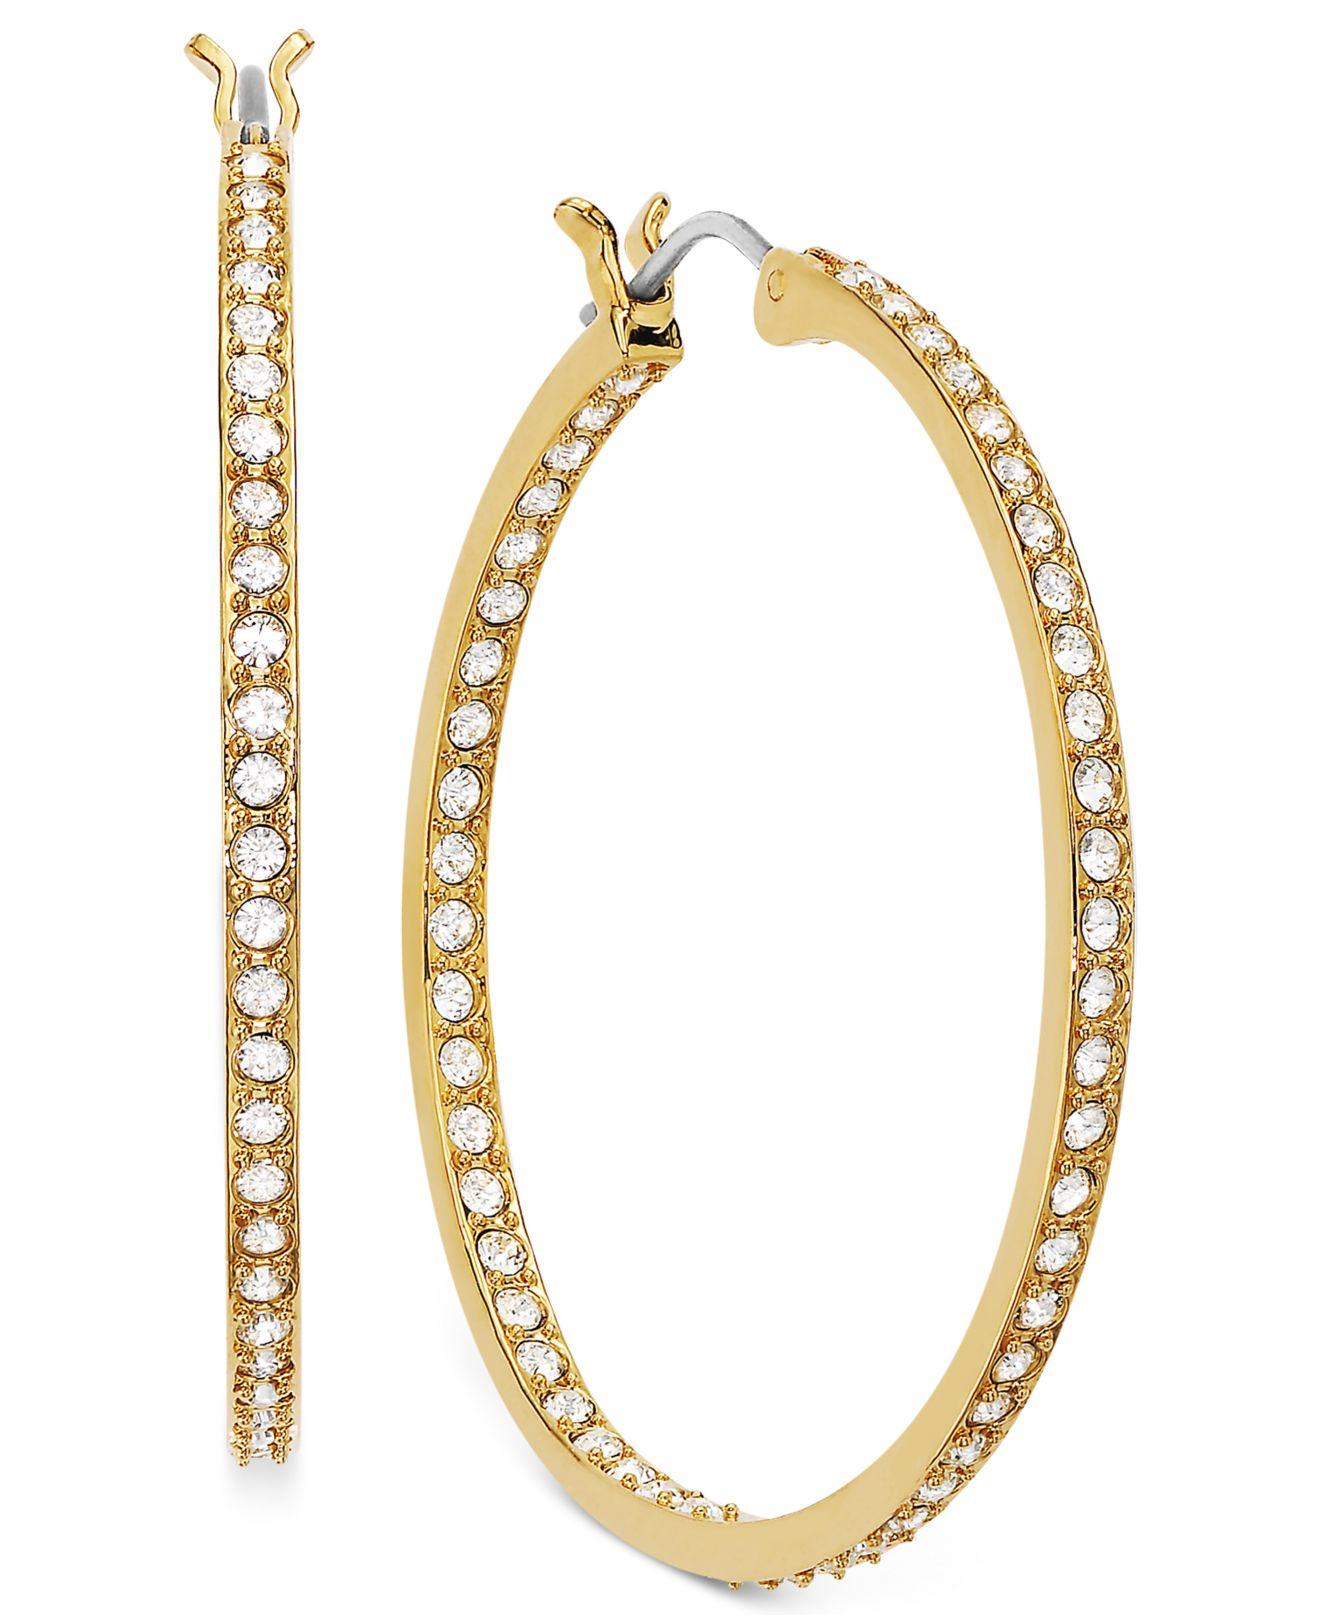 Lyst Swarovski Earring 22k Gold Plated Crystal Somerset Hoop Earrings In Metallic